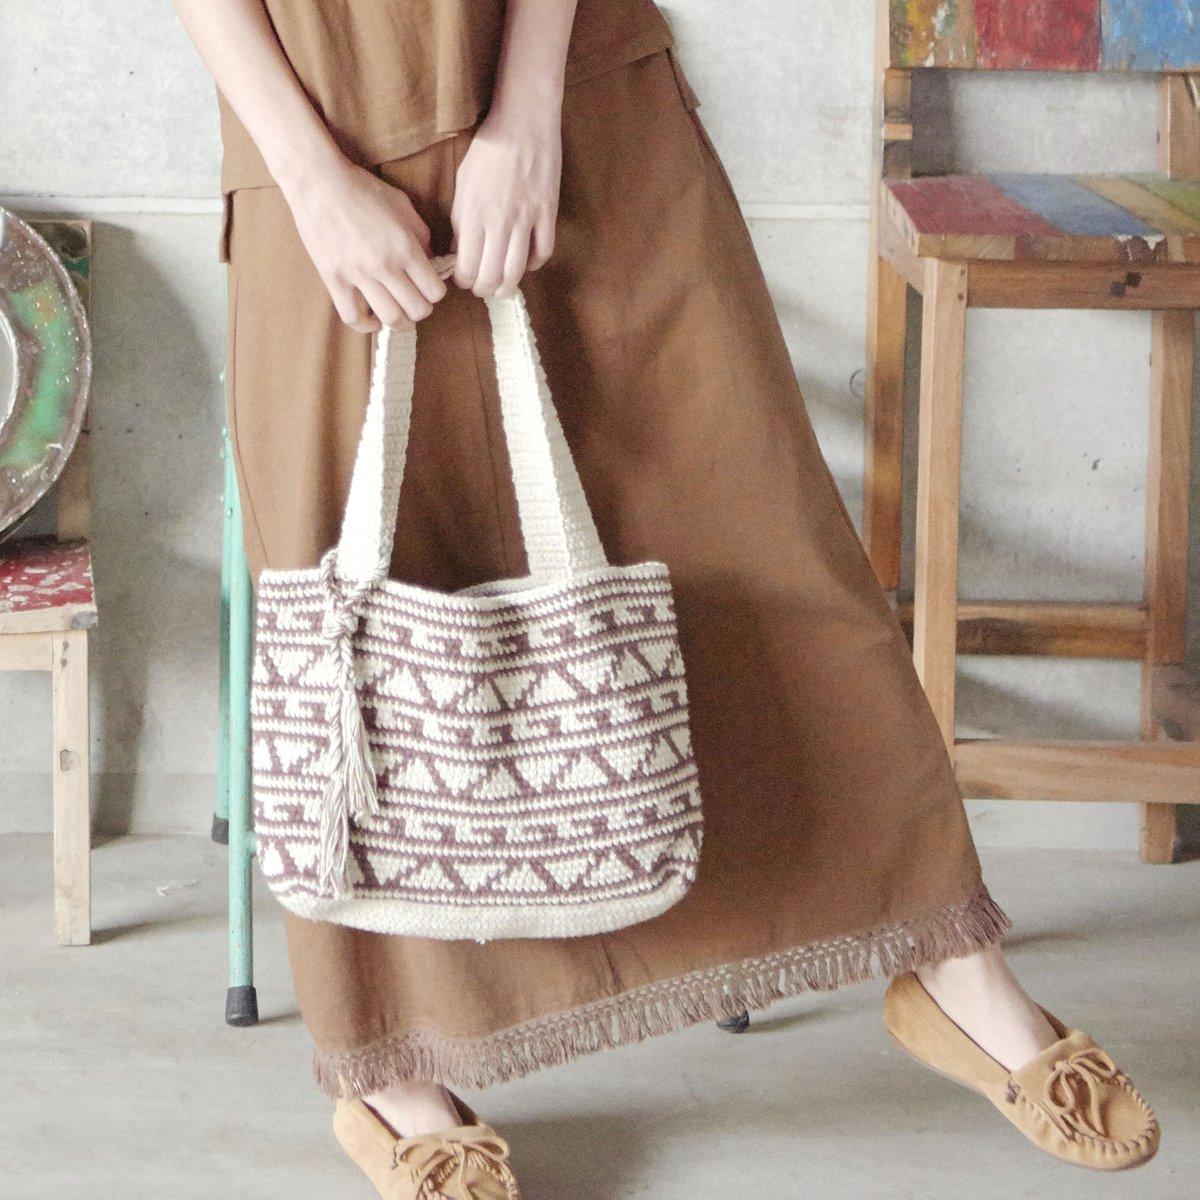 NEW ポップな幾何学柄のバッグ&ヴィンテージ風なバッグが入荷~♪ 程よいエスニカルなファッション小物が充実(*'∀') この時期欠かせない薄手の  #ストール にも注目!